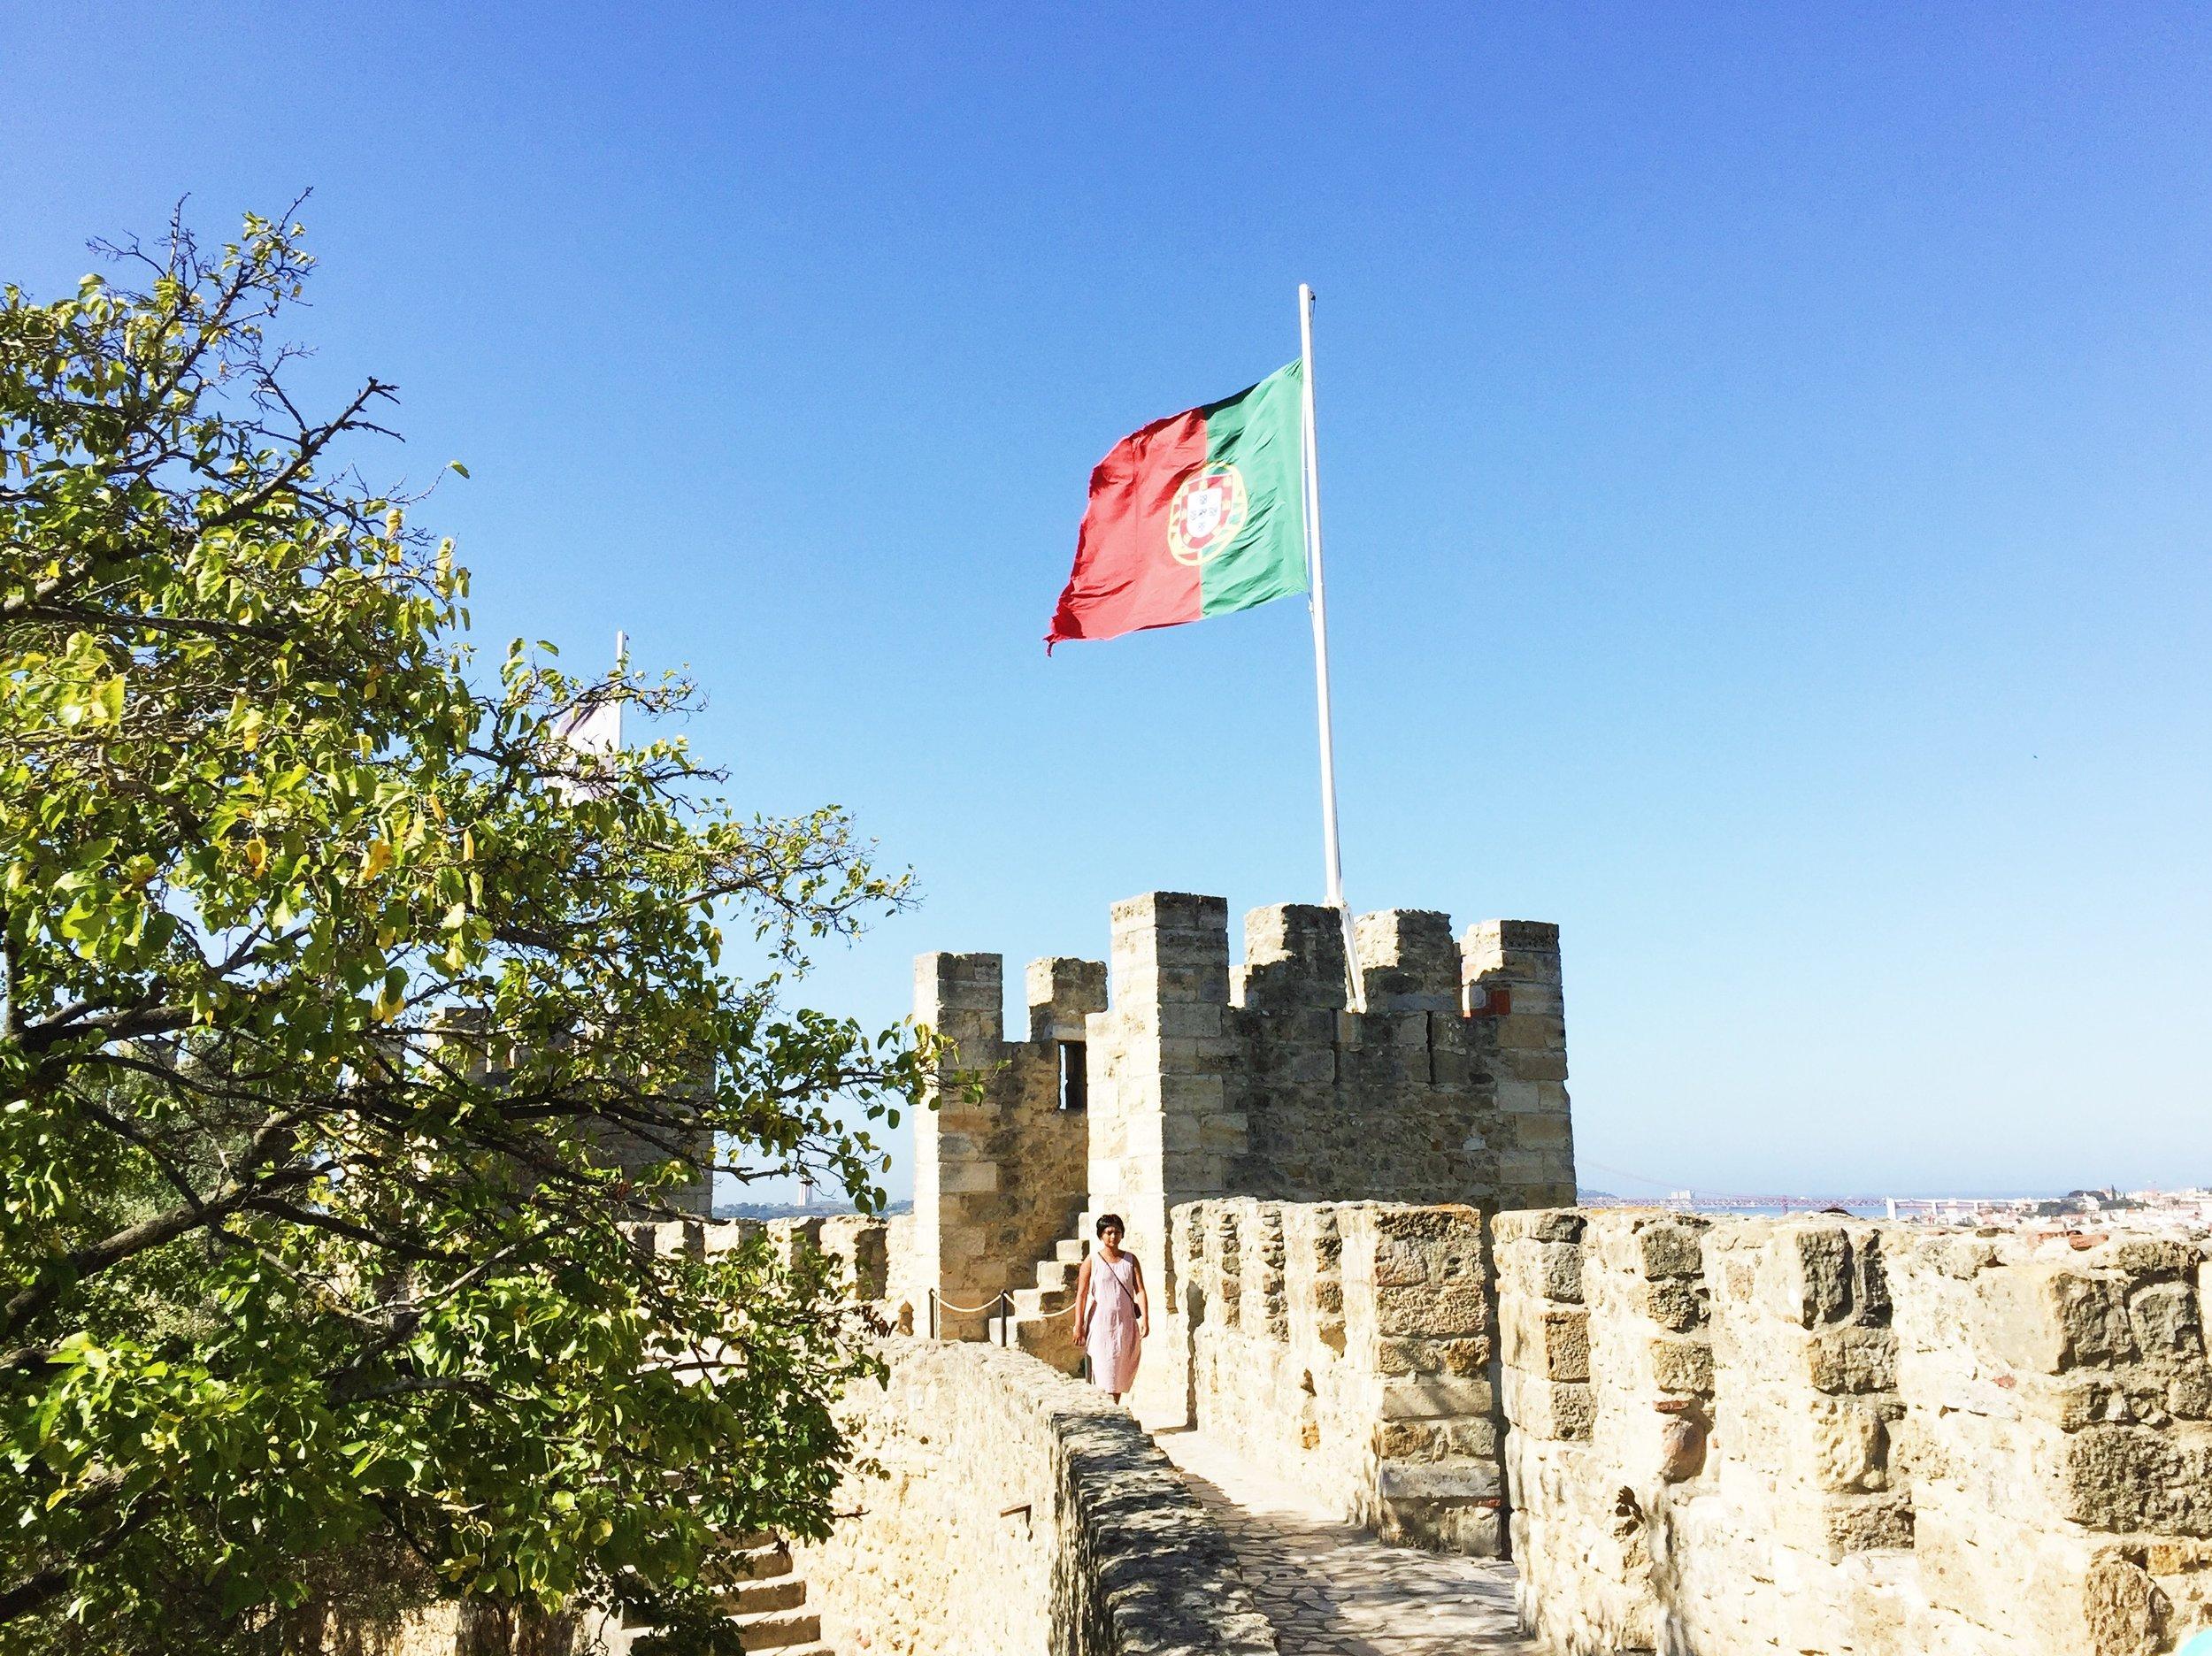 Castelo de Sao Jorge (Alfama)